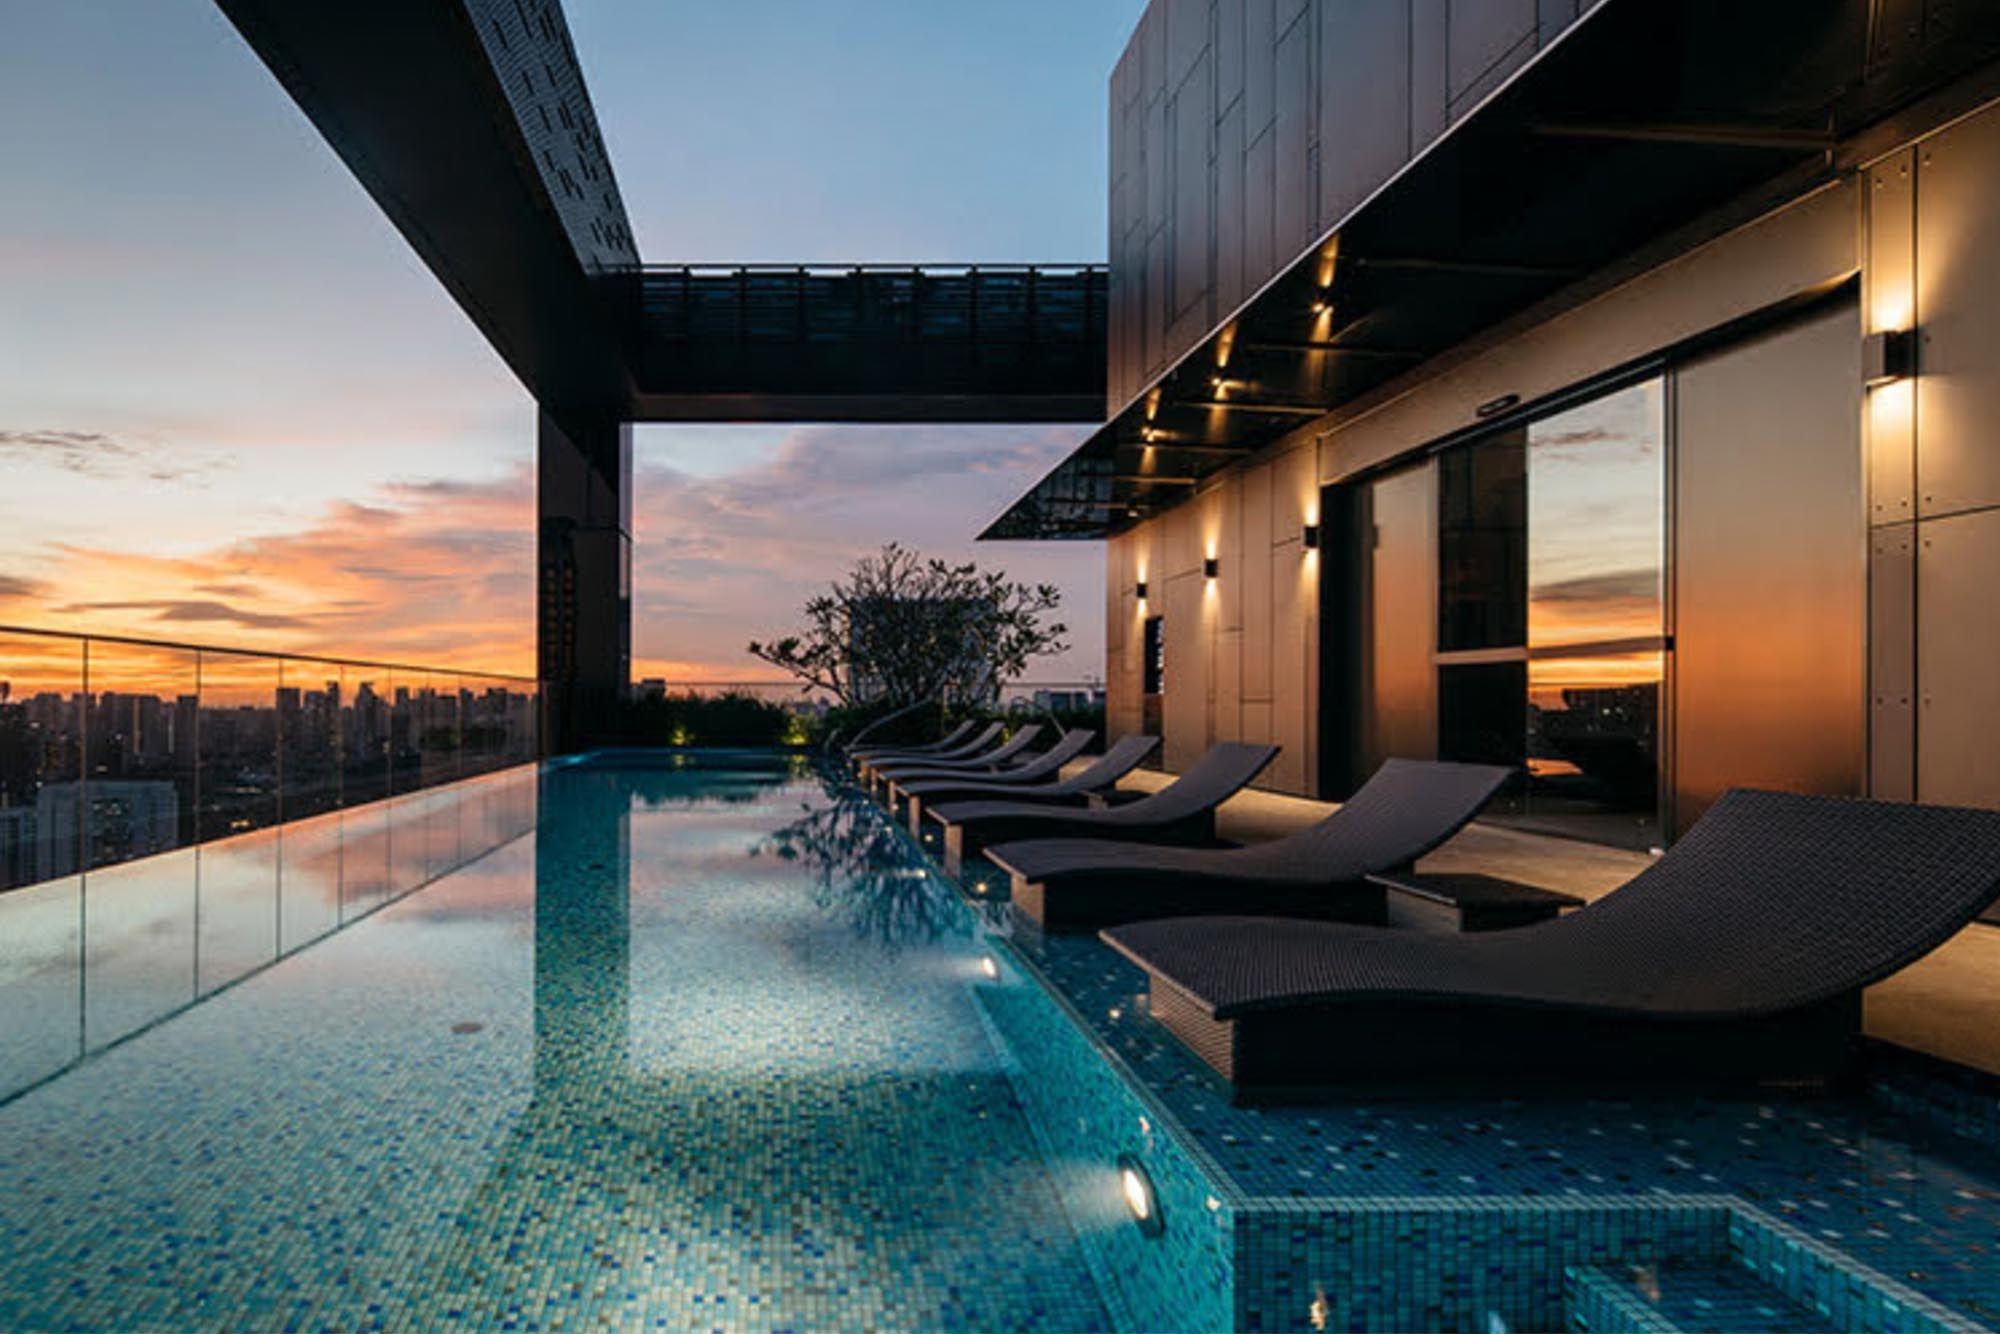 Photo: The Clan Hotel Singapore